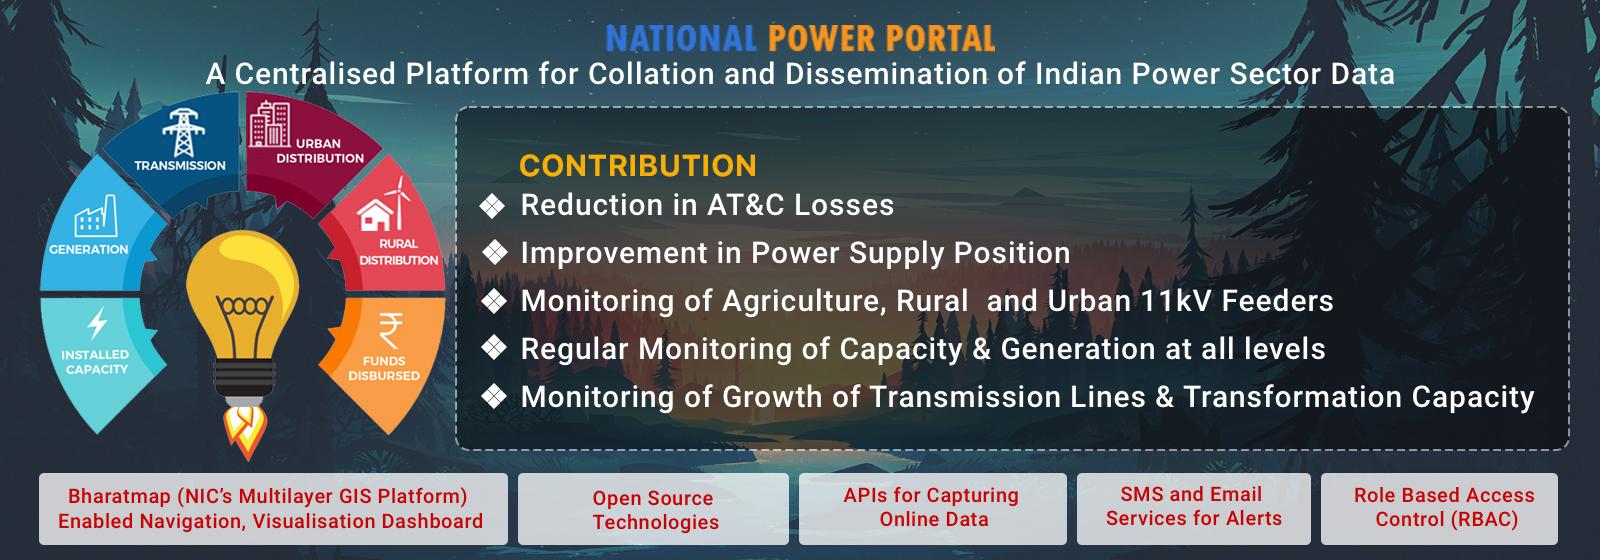 Image of National Power Portal